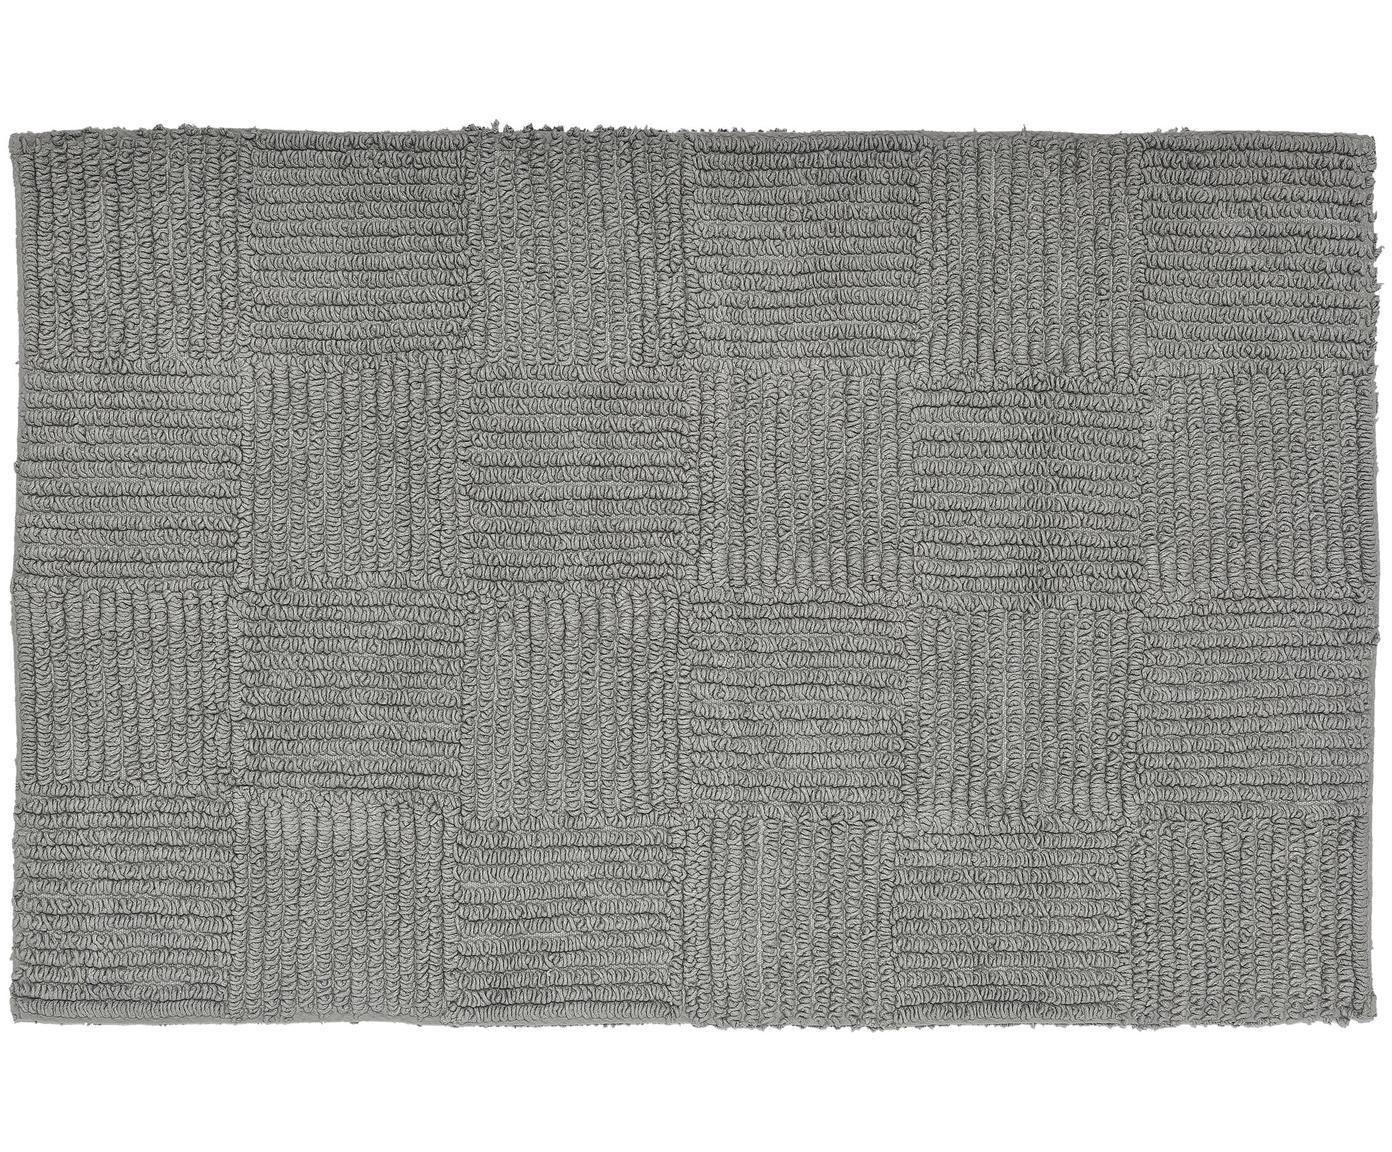 Badvorleger Sienna, 100% Baumwolle, Grau, 60 x 90 cm